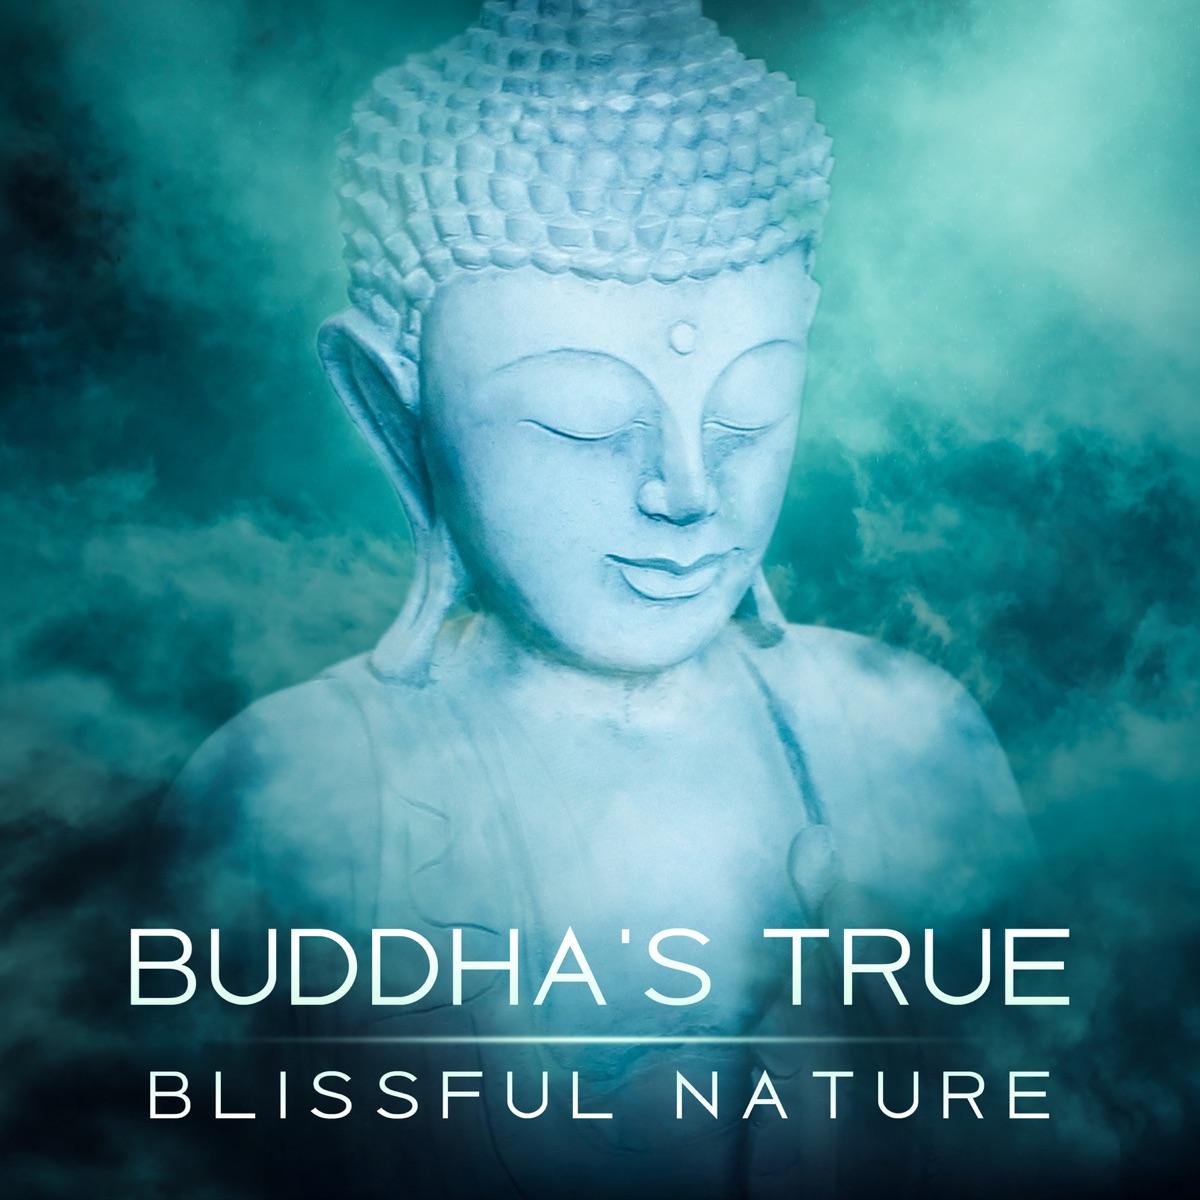 Buddha's True Blissful Nature: Essence of the Mind